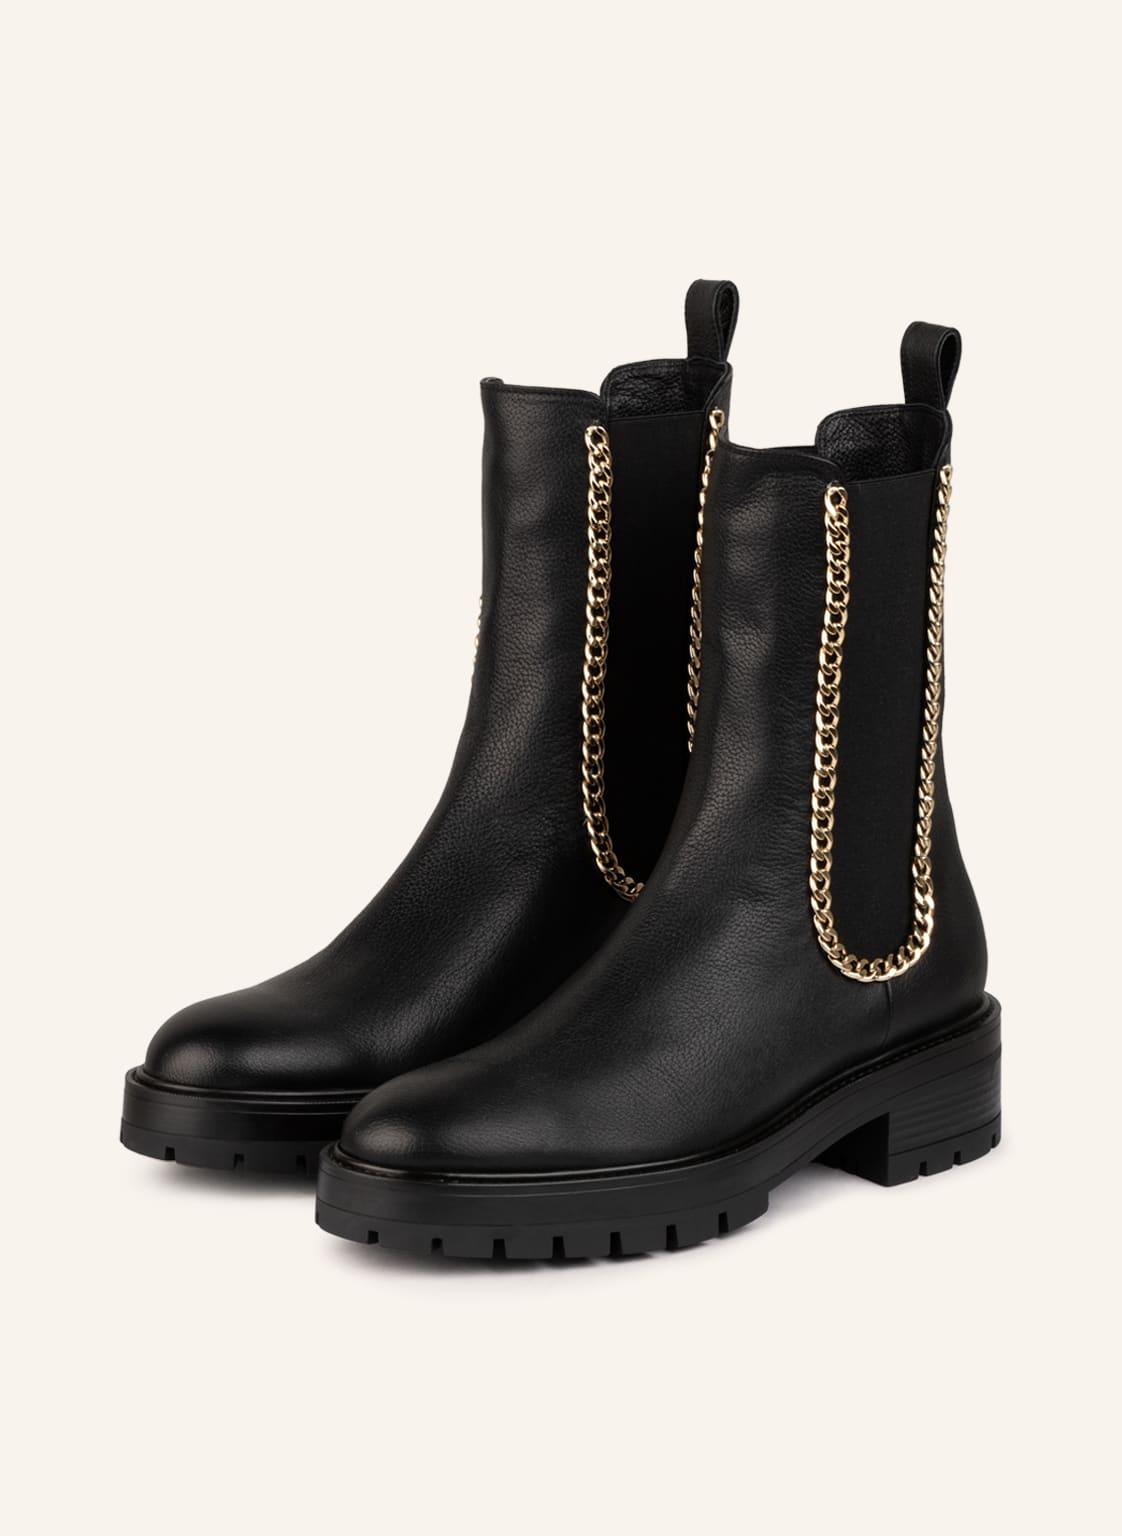 Image of Aquazzura Chelsea-Boots Mason schwarz